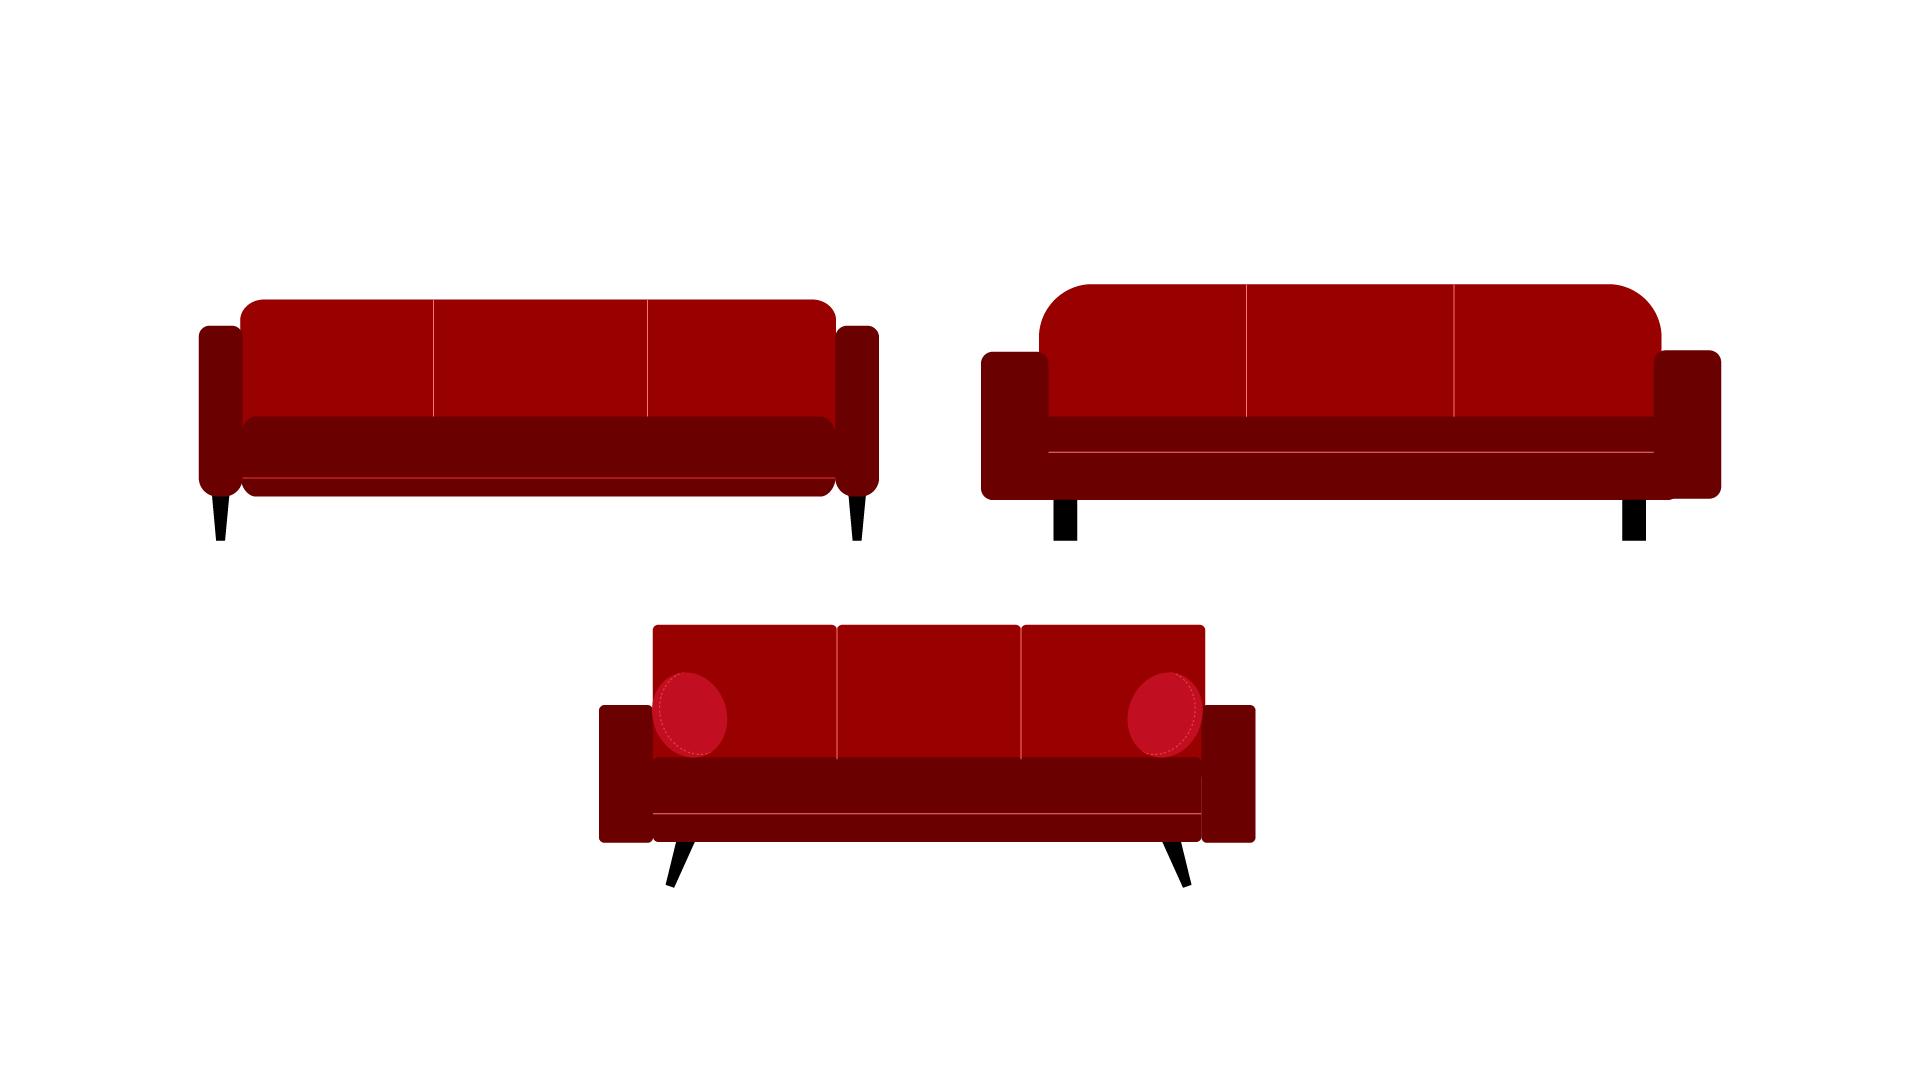 Character_Design_vari_v2-06.png